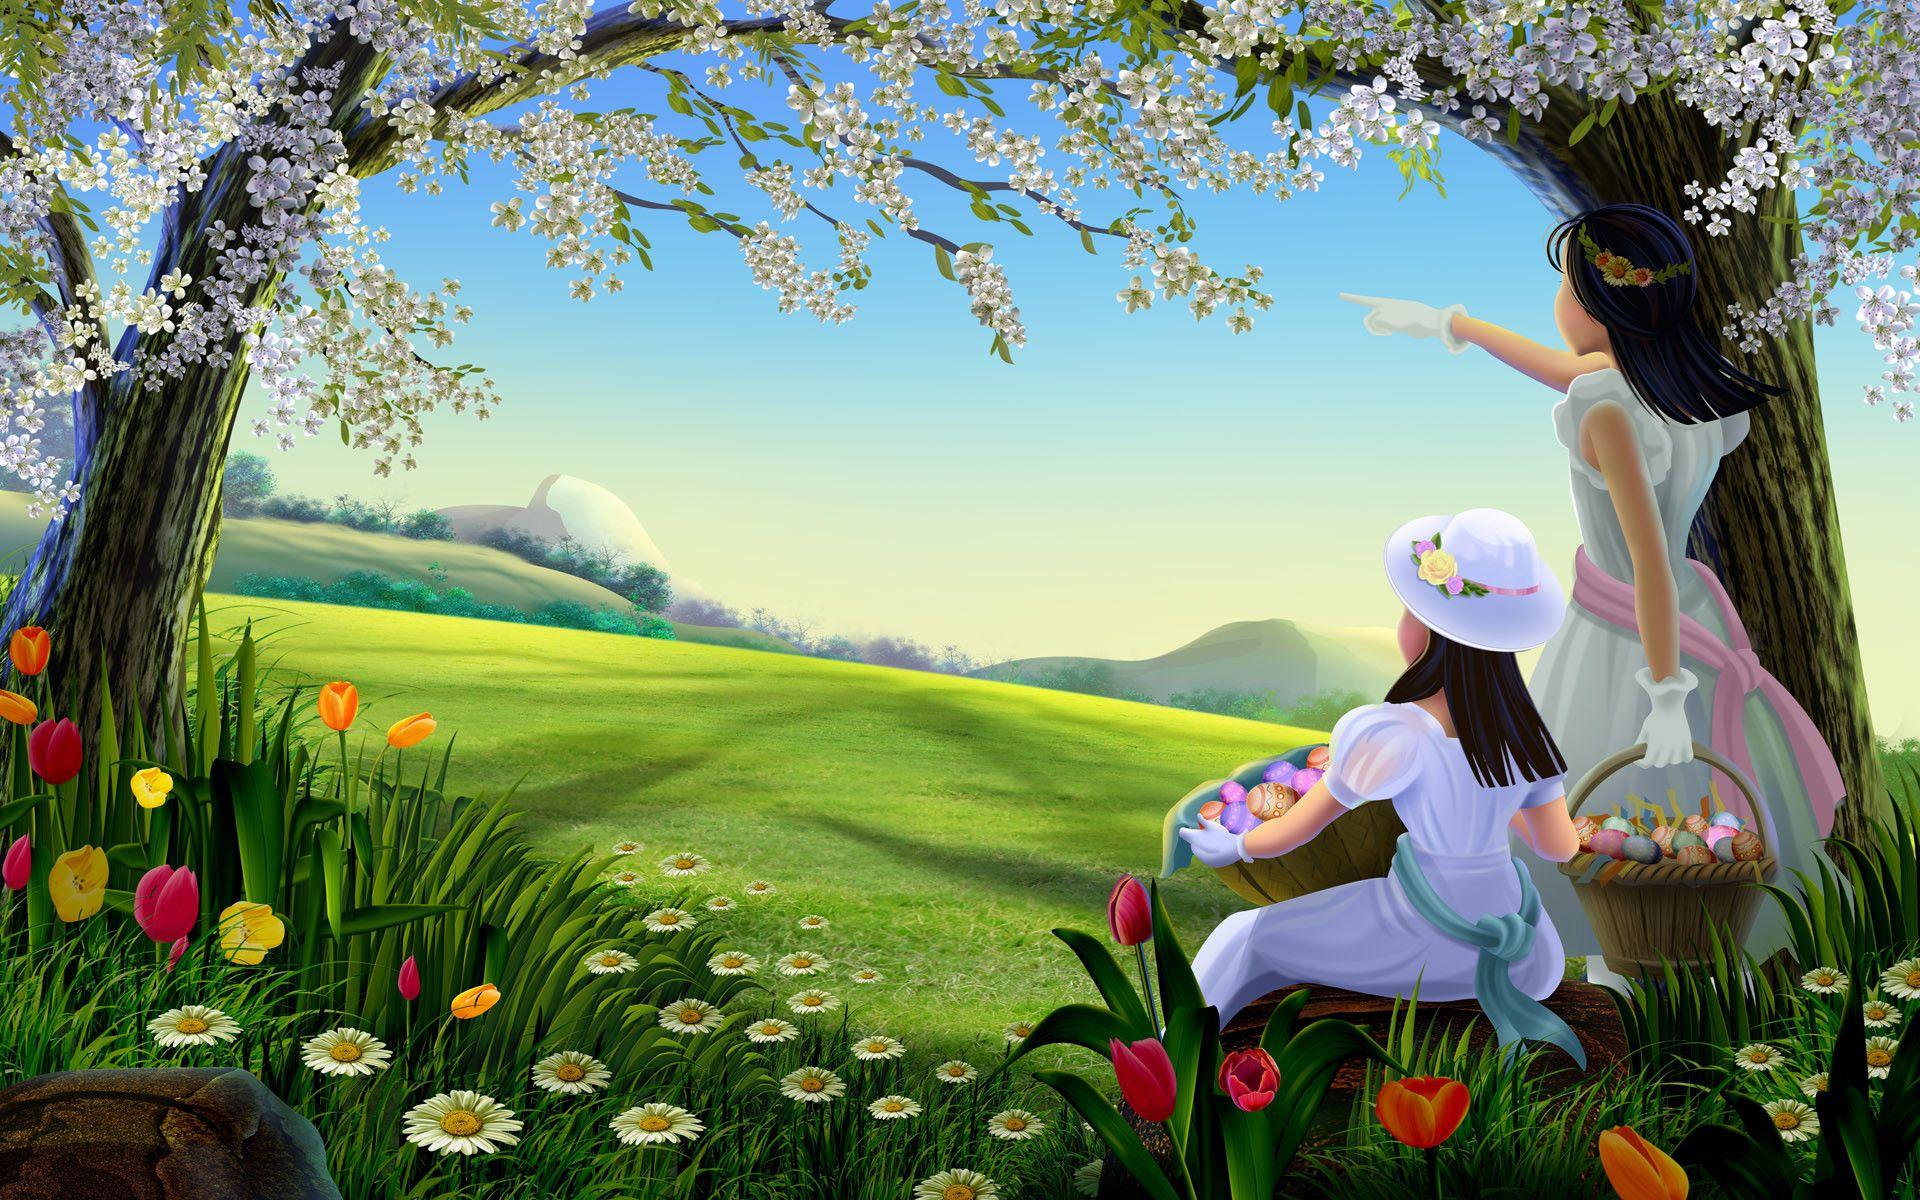 1920x1200 Beautiful Nature Cartoon Hd Desktop Wallpaper Hd Nature Wallpapers Beautiful Nature Wallpaper Spring Desktop Wallpaper